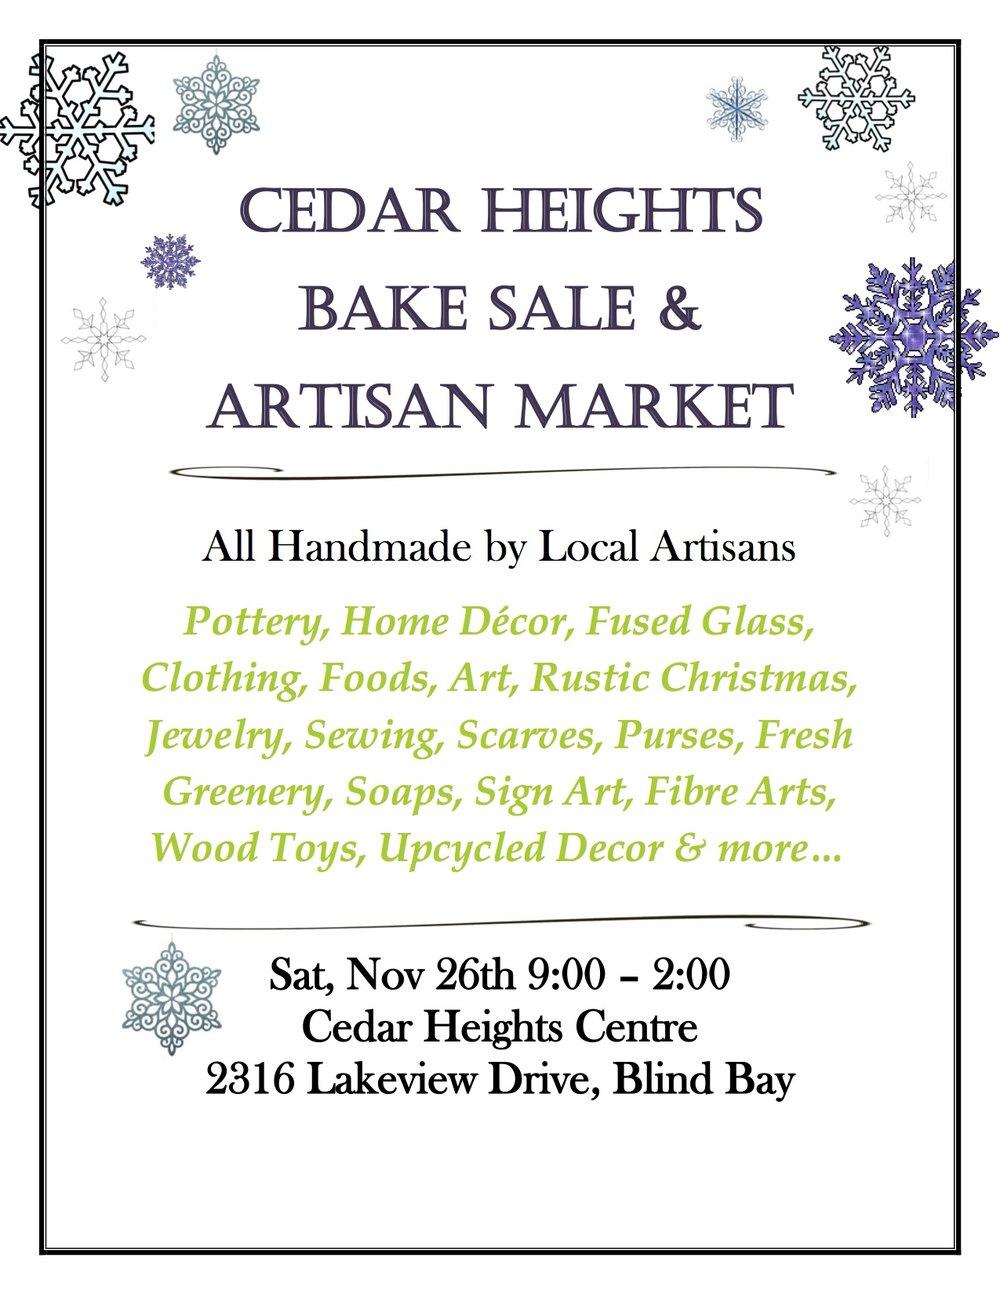 Cedar Heights Bake Sale & Artisan Market